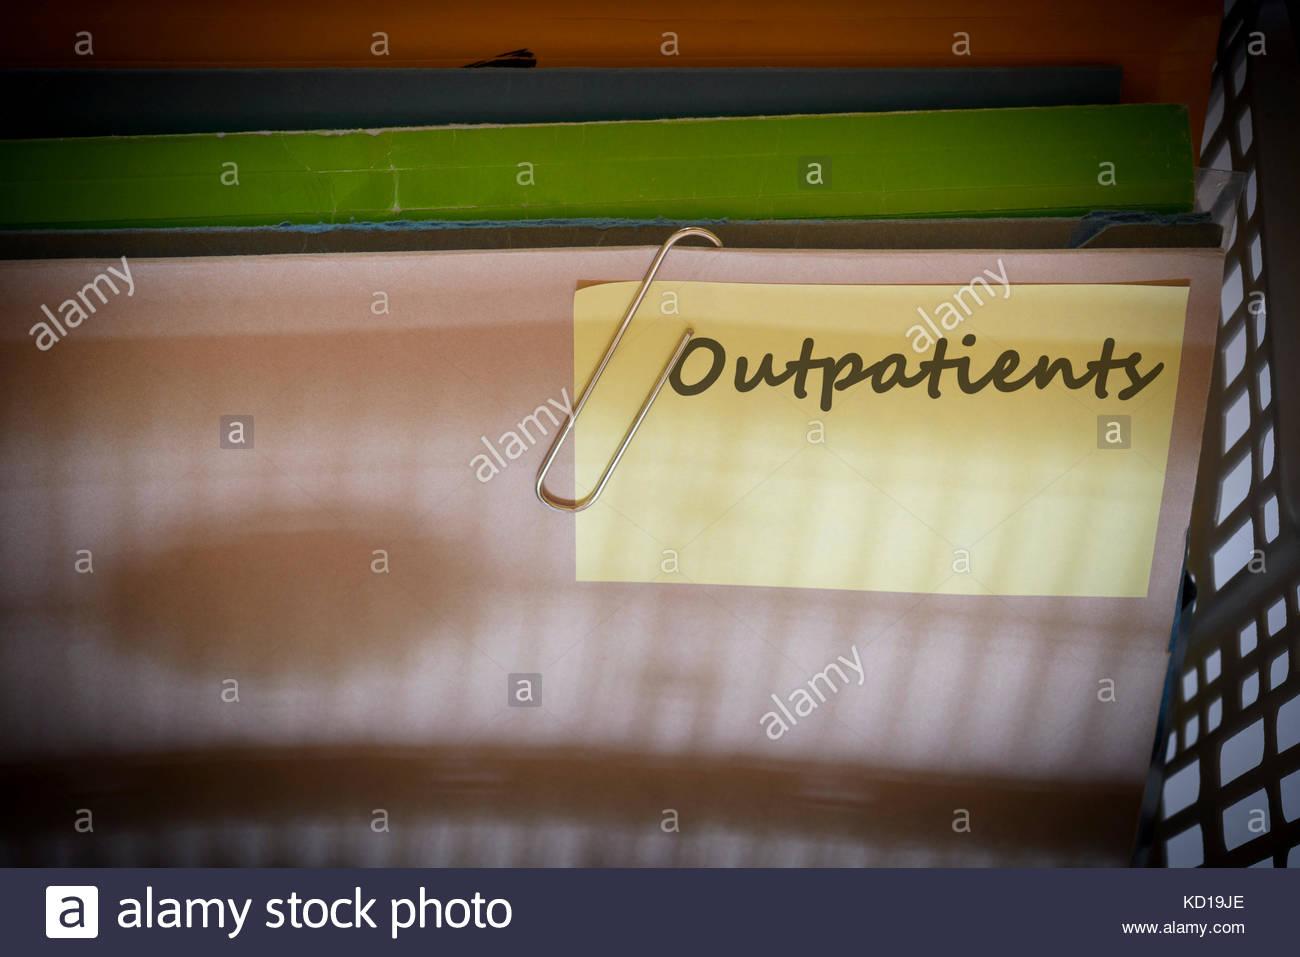 Outpatients written on document folder, Dorset, England. - Stock Image